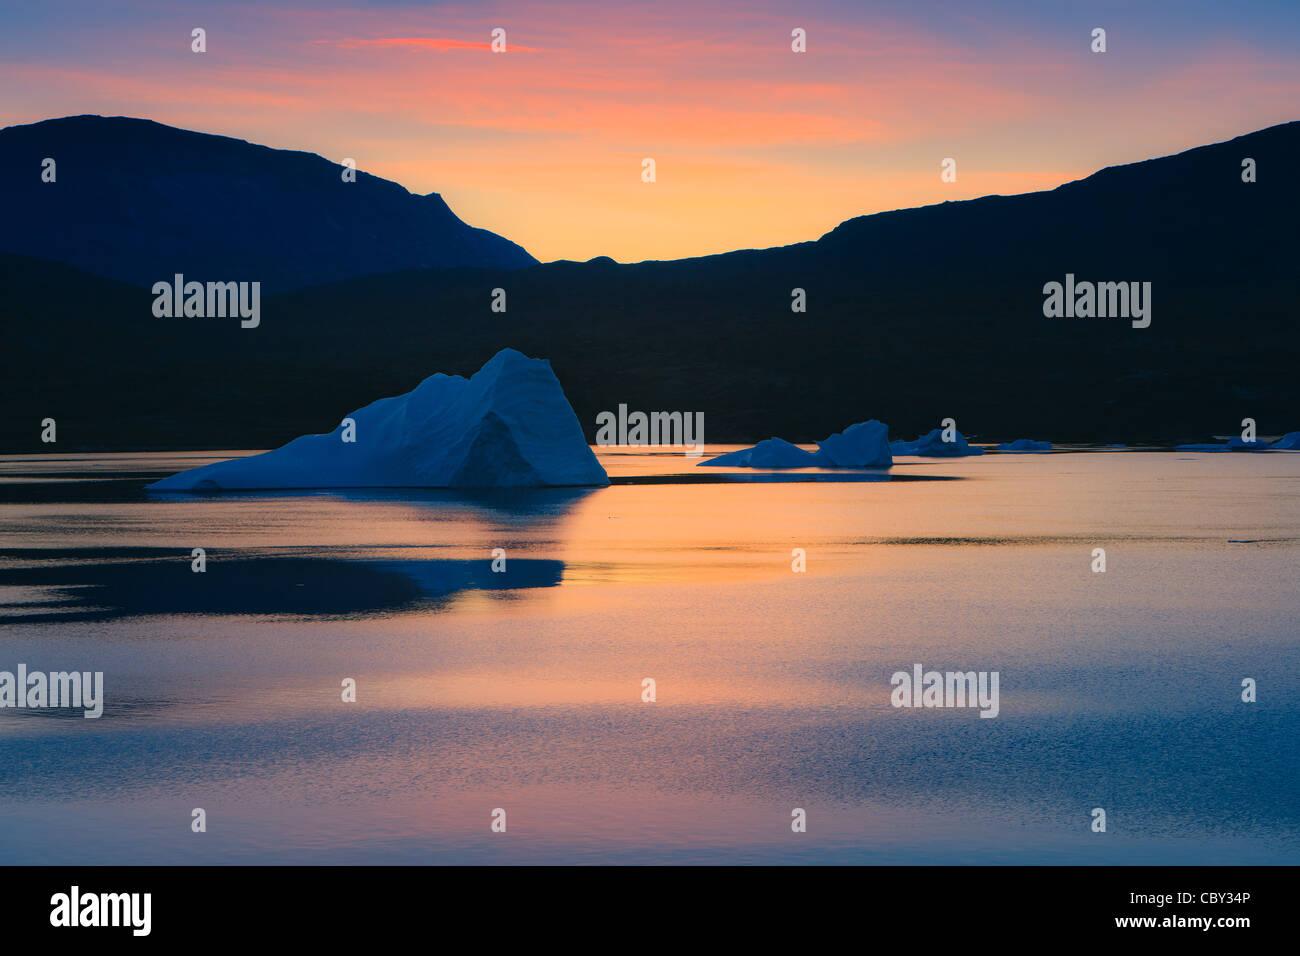 Amanecer en el fiordo, Scoresbysund Rode, Groenlandia Foto de stock